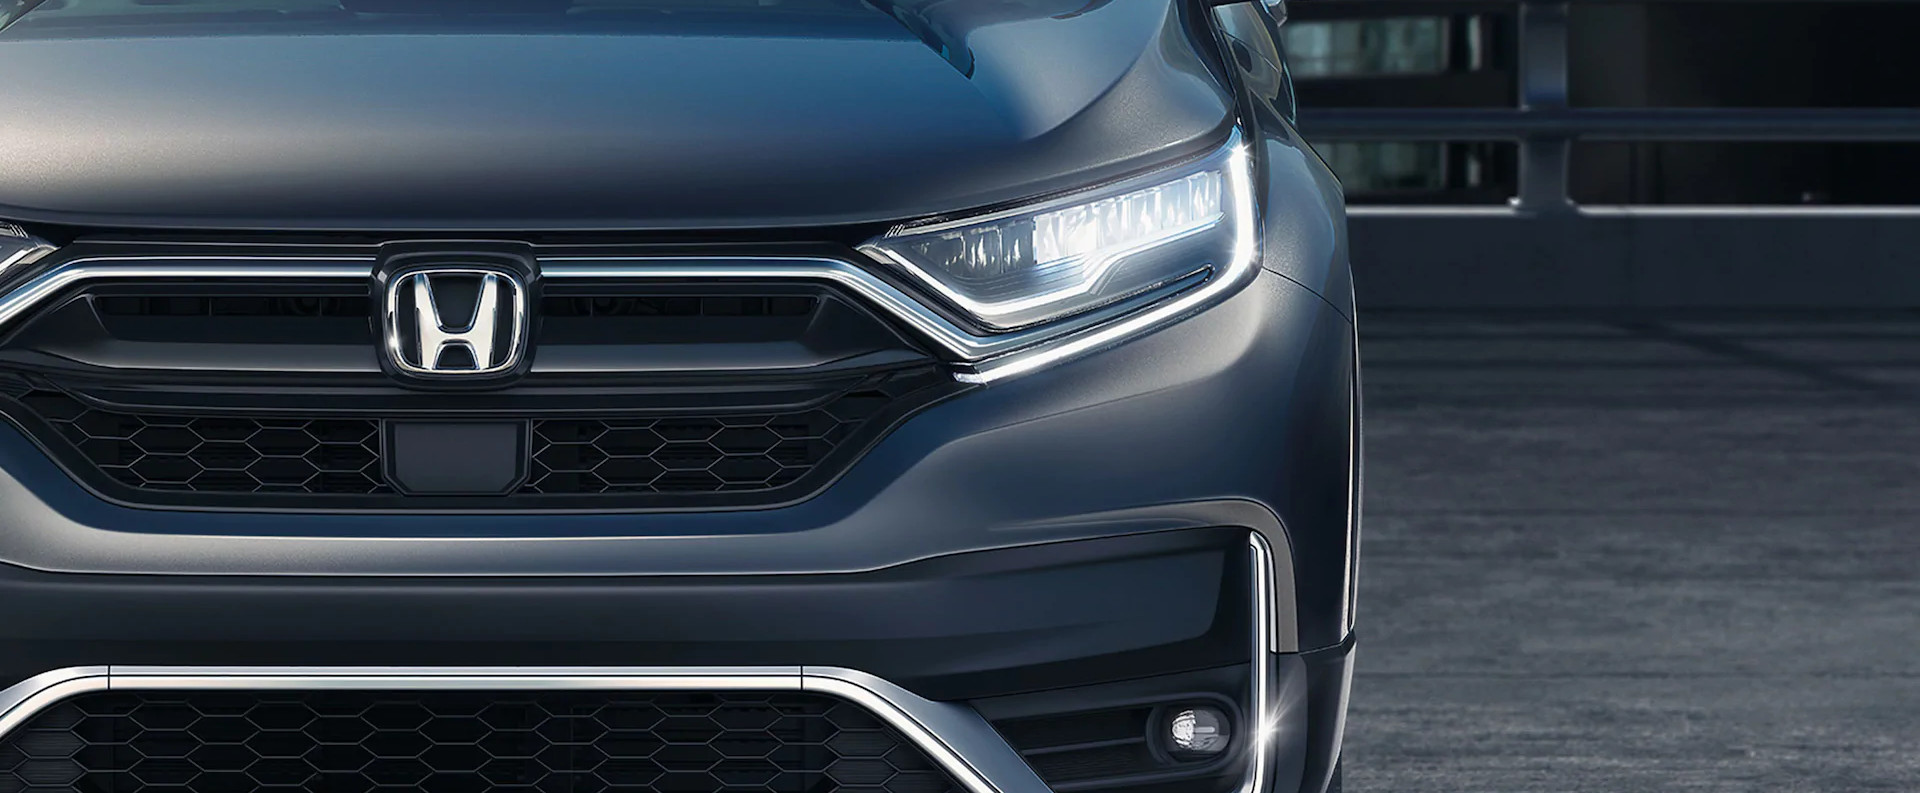 2020 CR-V LED Headlights